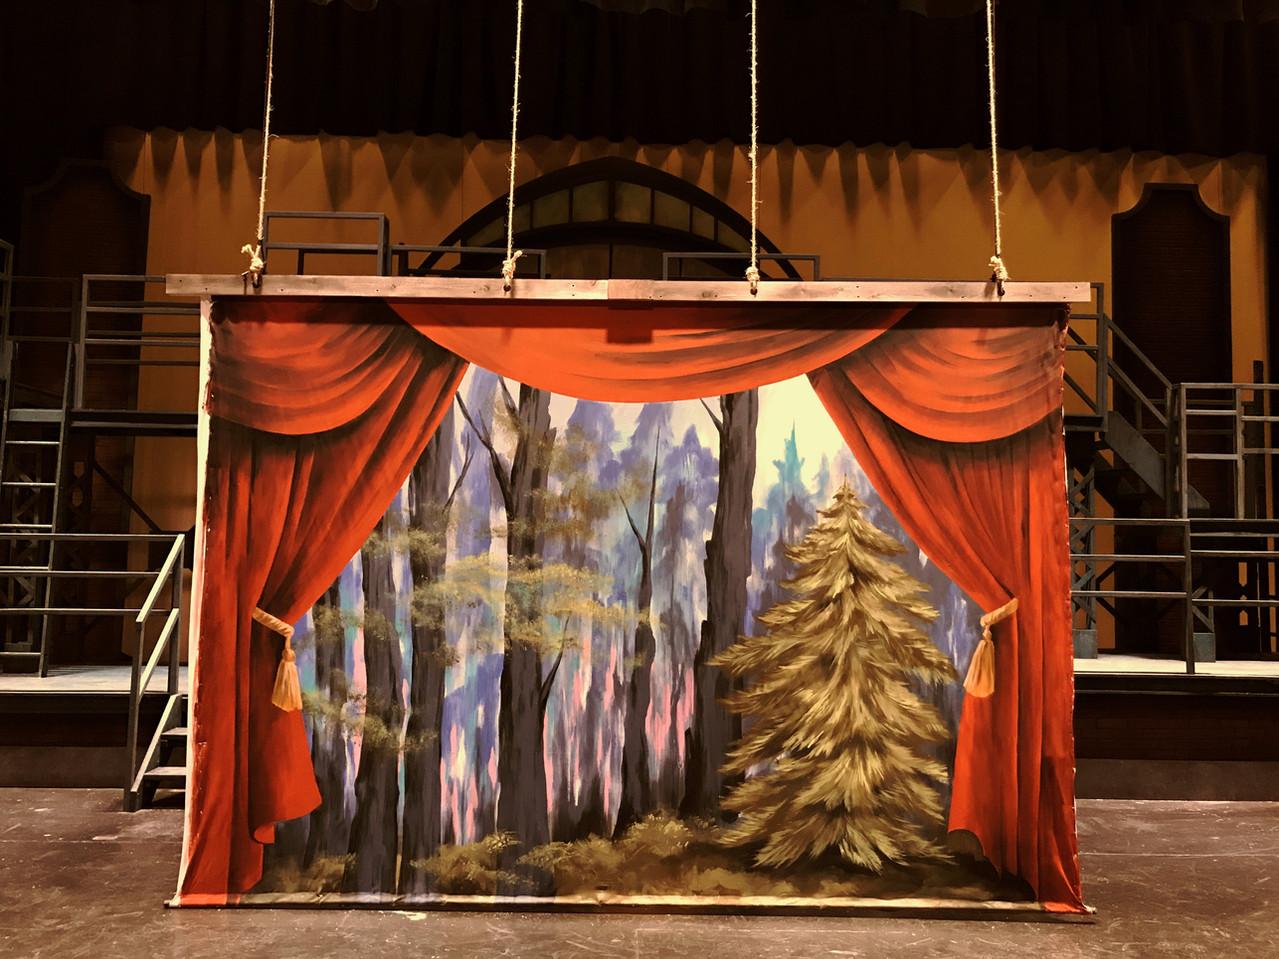 Medda's Theatre 9' x 13' Drop - Pamela Spika, Scenic Paint Charge